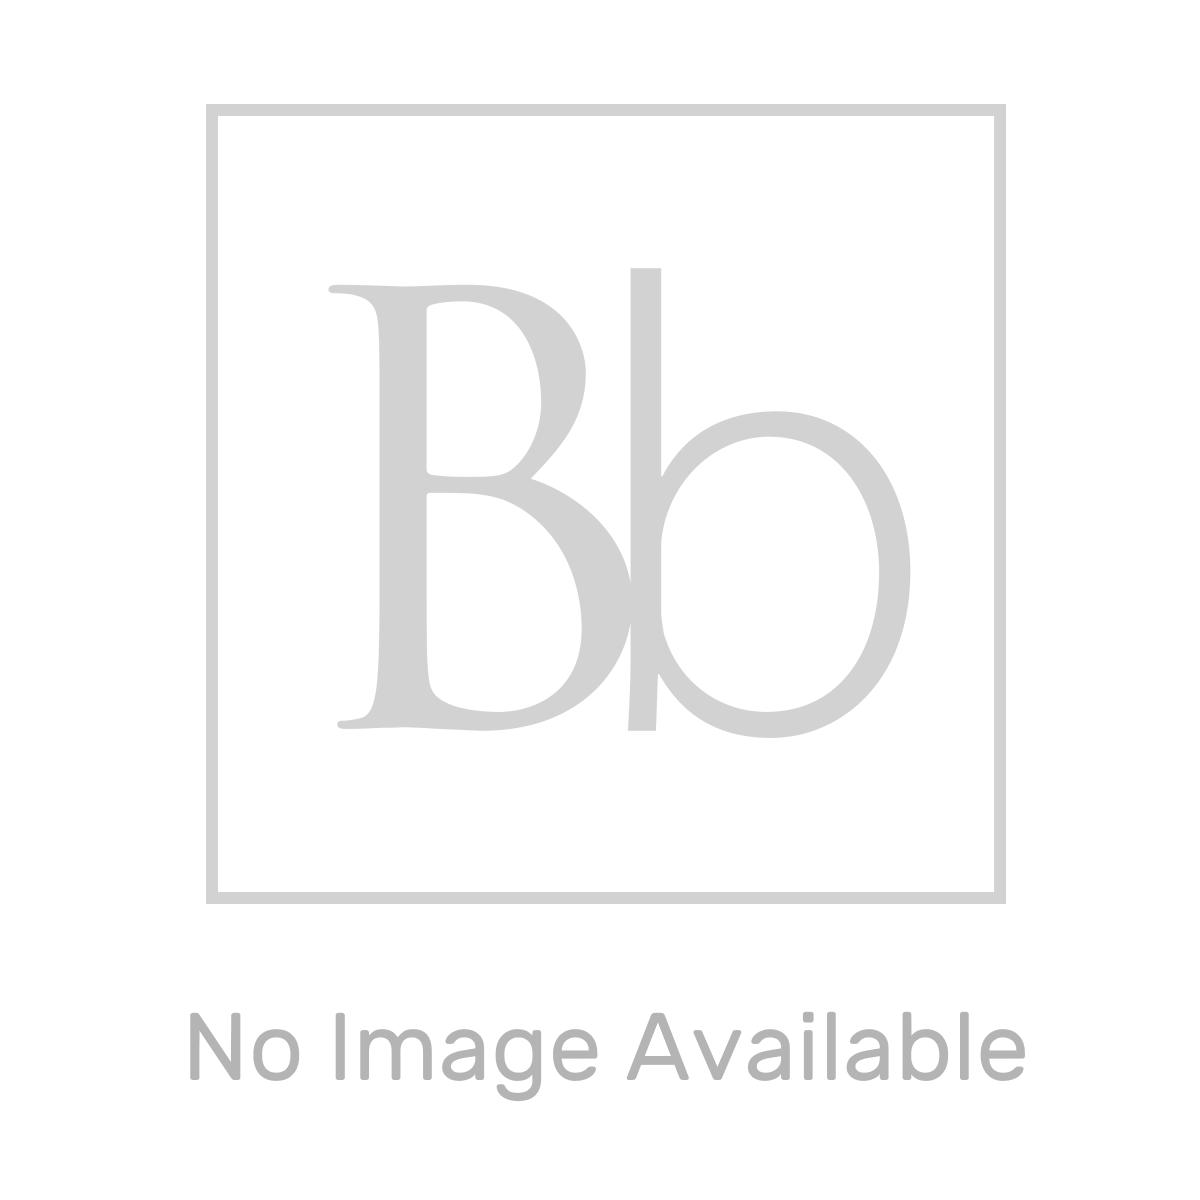 Sensio Grace Soft Edge Diffused LED Mirror